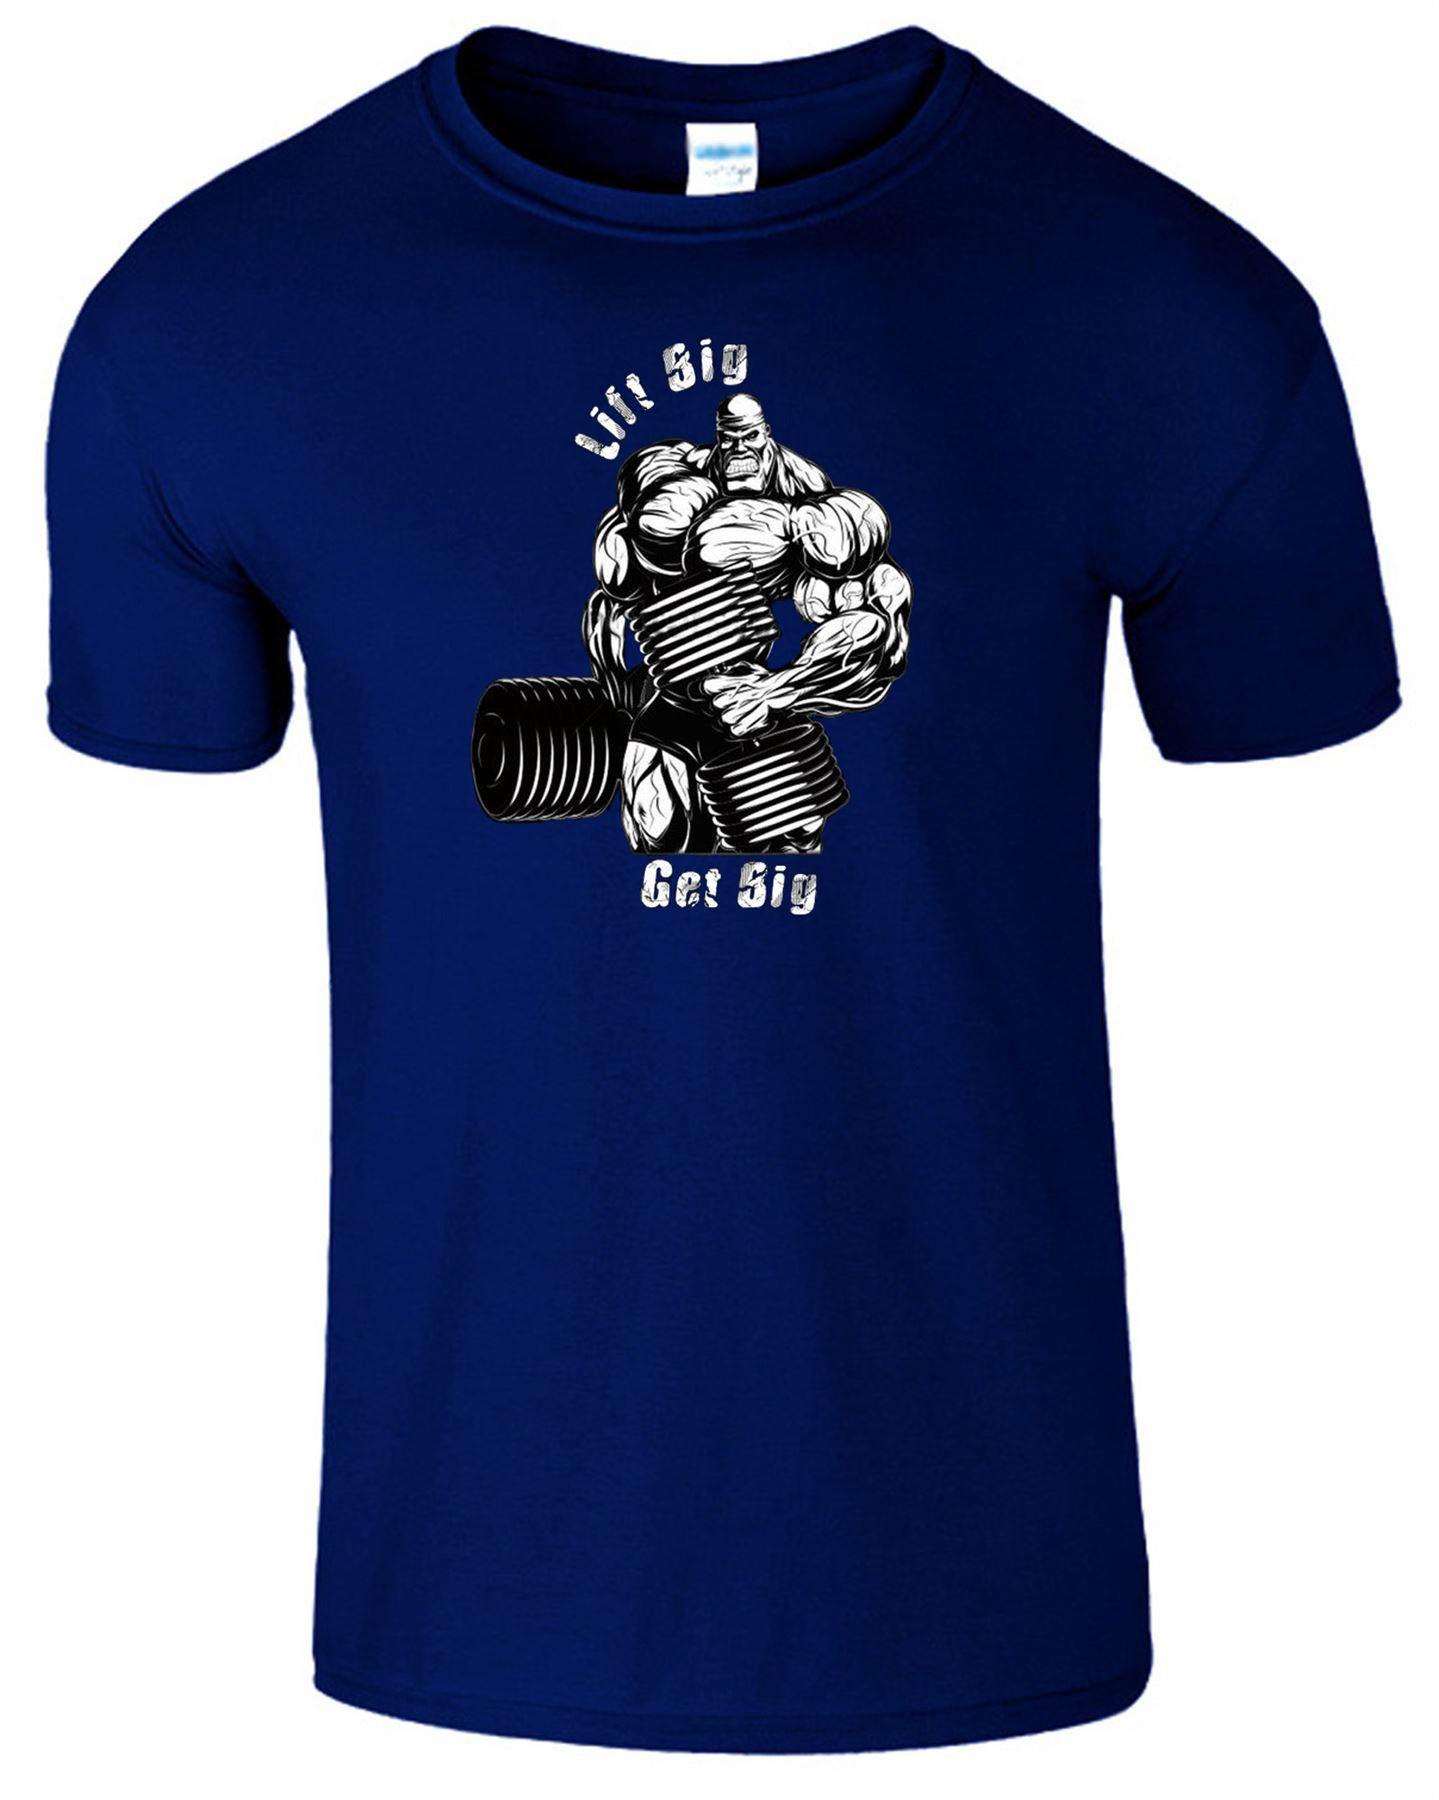 Lift big get big mens t shirt gym weight lifting workout for Big mens t shirts